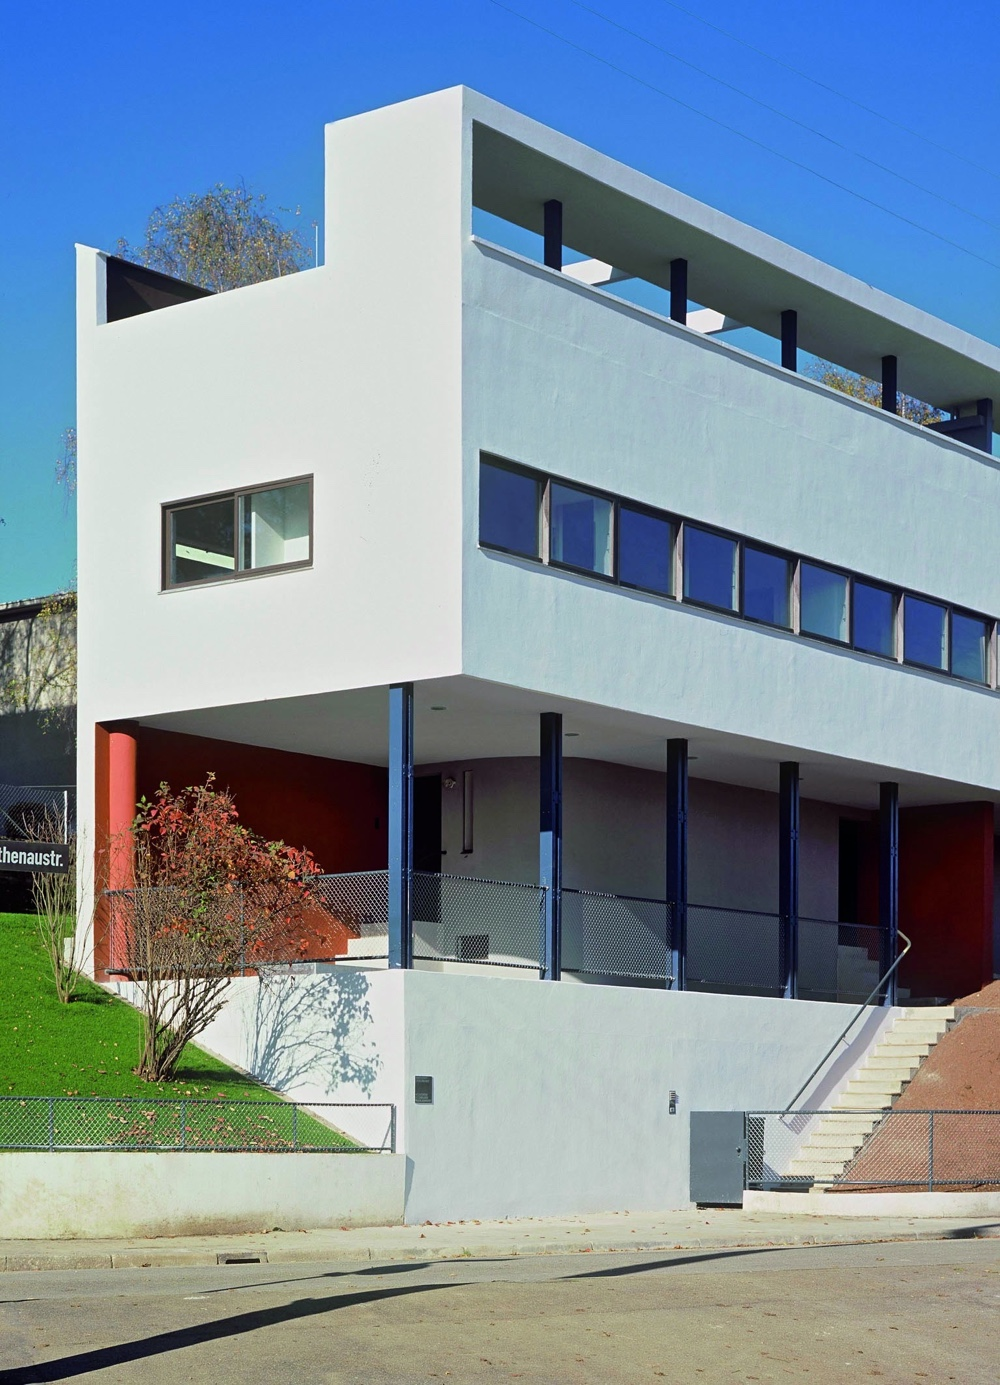 Twinhouses at Weissenhof Estate, Stuttgart, Germany, 1927. Photo byThomas Wolf©FLC/ADAGP.